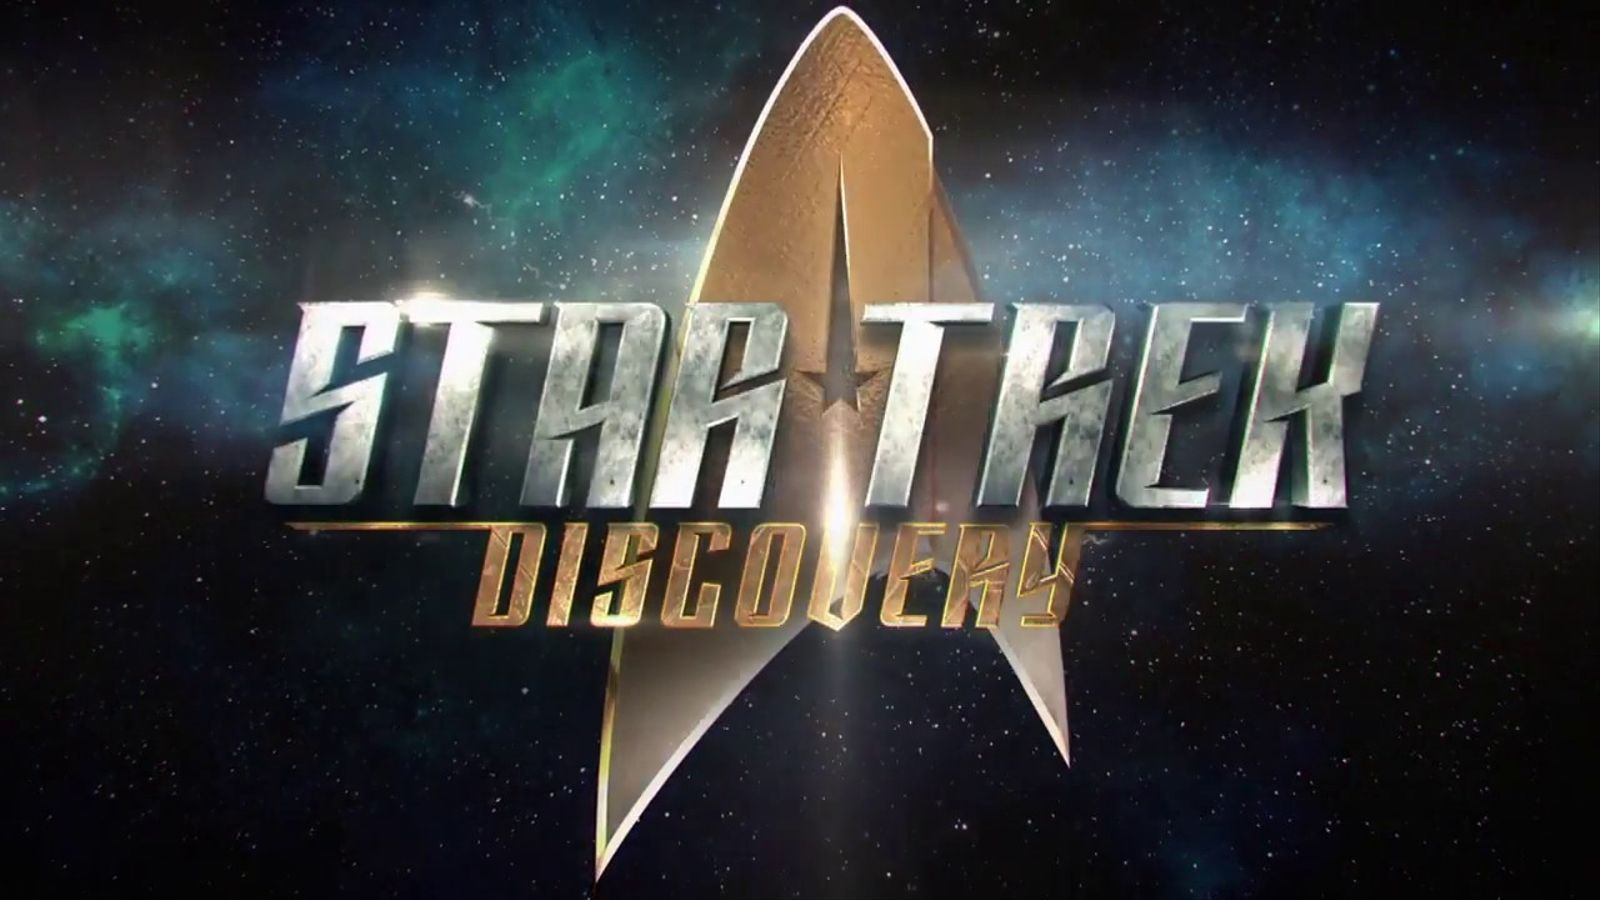 Tràiler de 'Star Trek: Discovery''